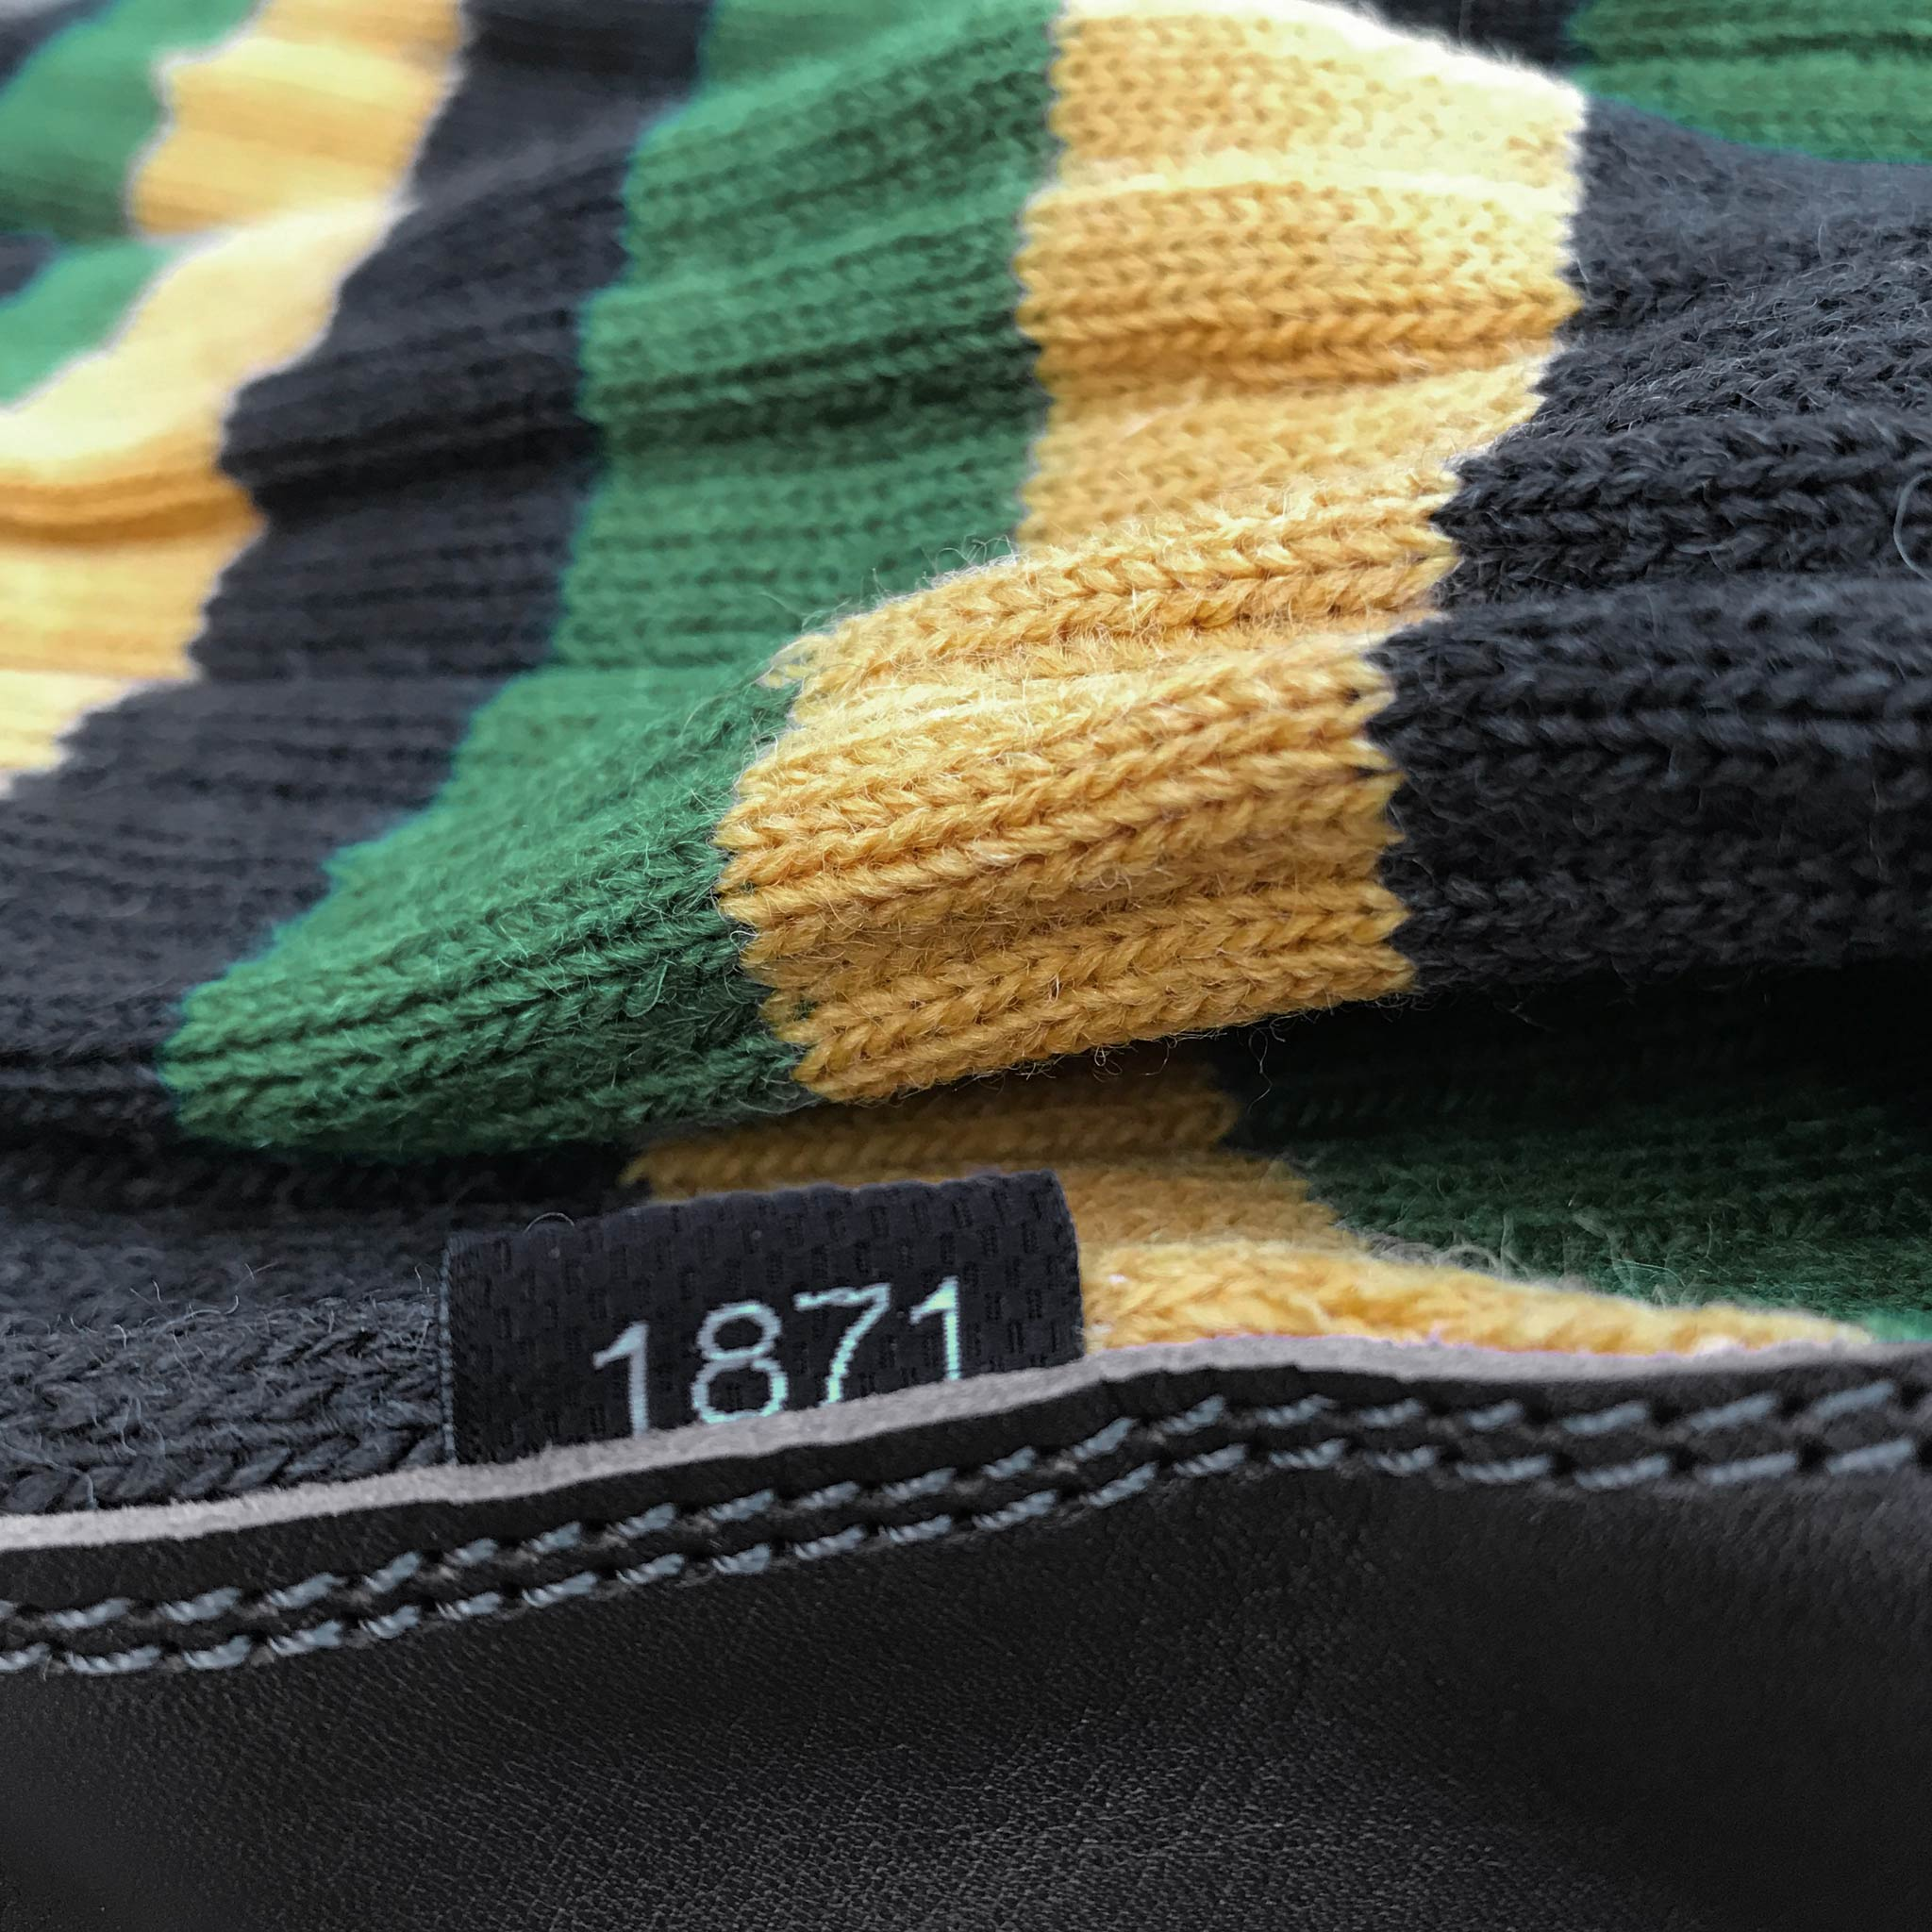 Slipper Sock black, green and mustard stripe close-up